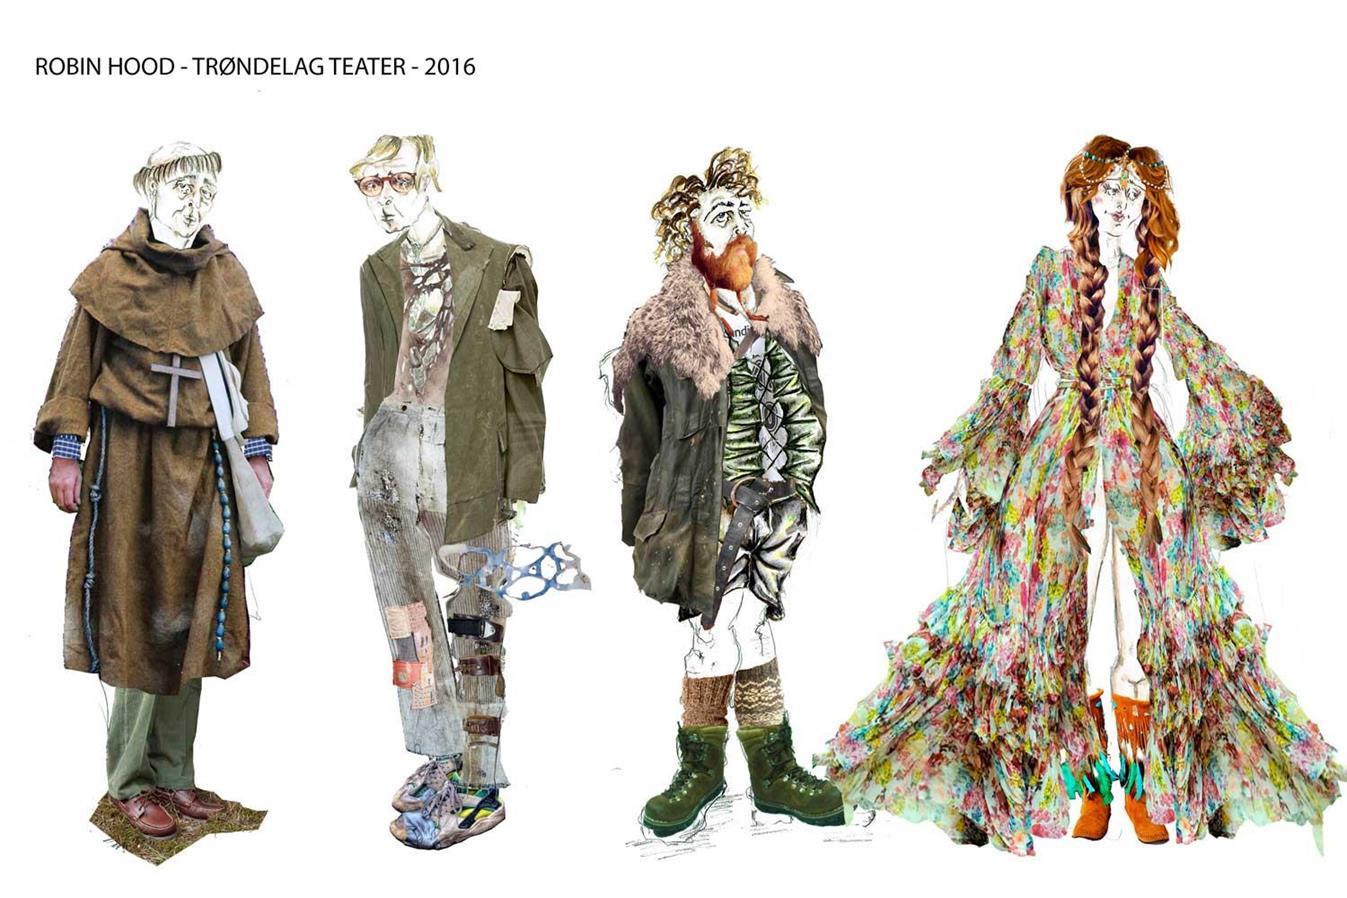 Robin Hood - Director: Mads Bones Costume design: Christina Lovery